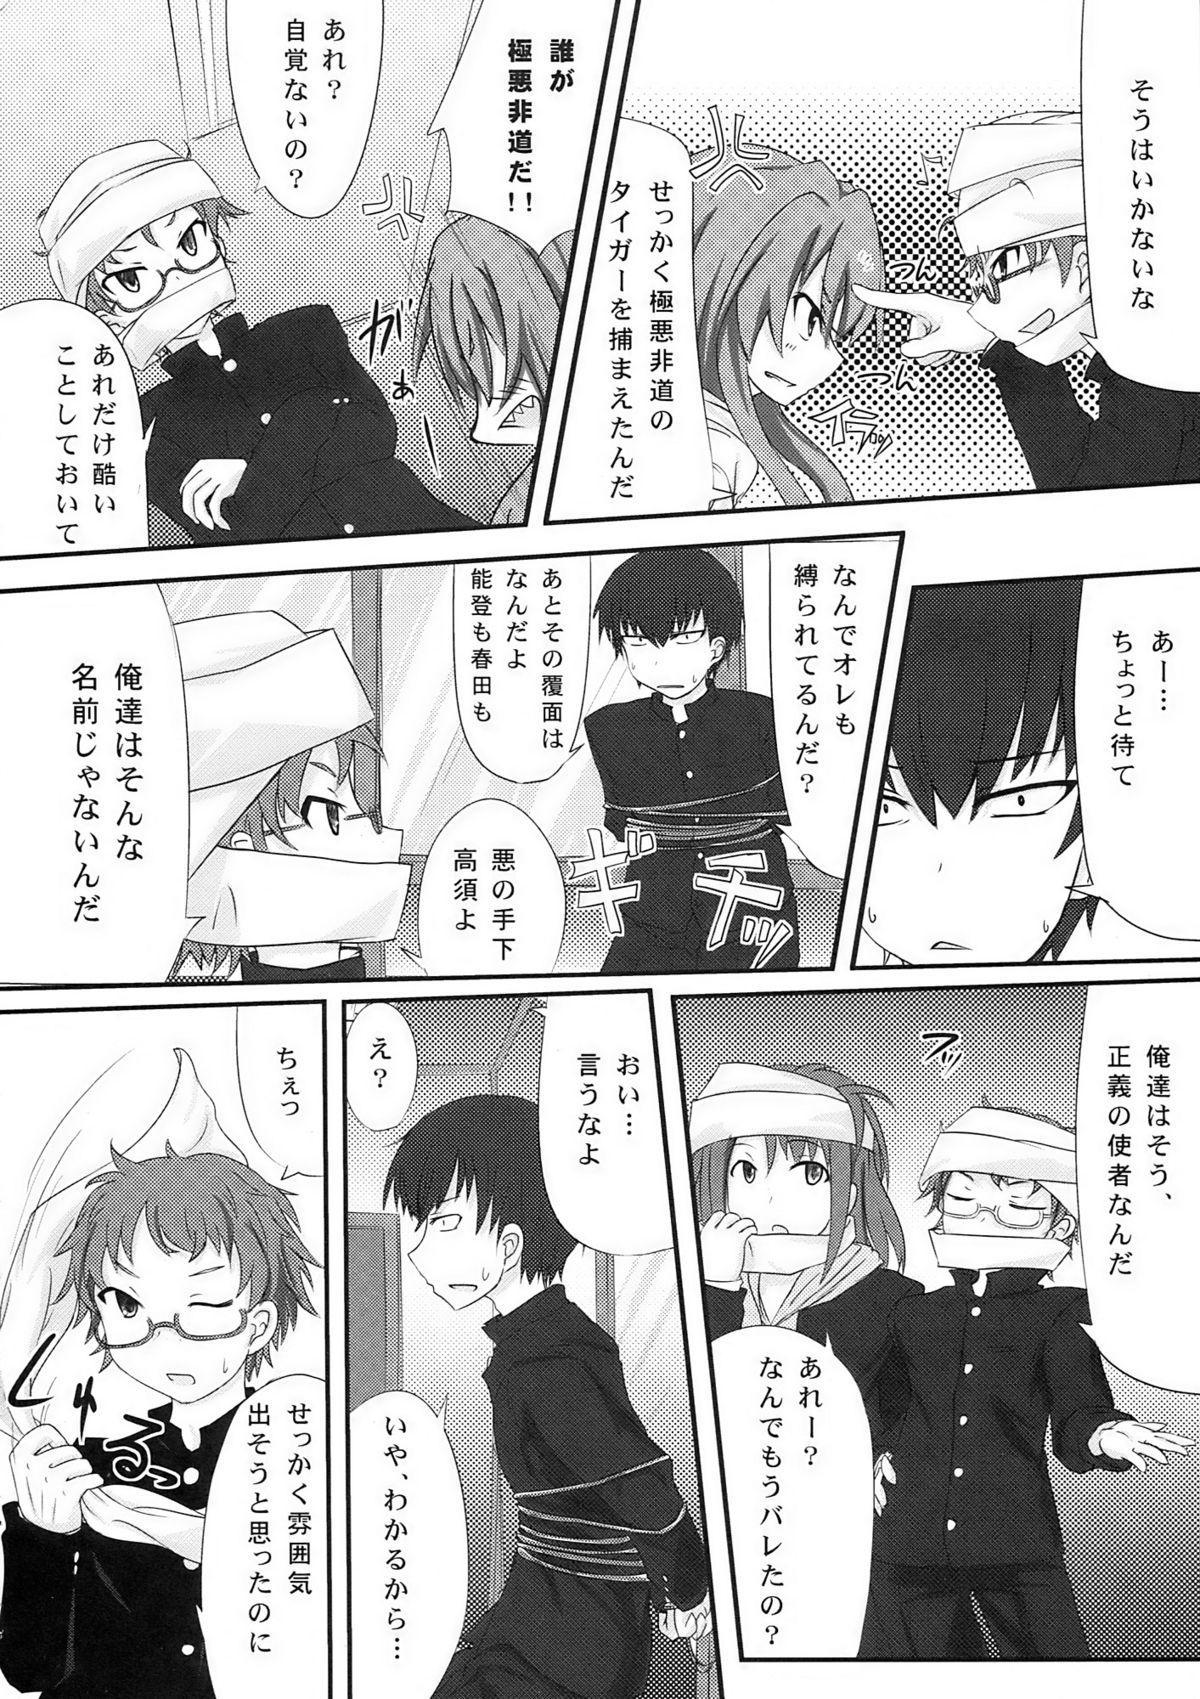 Shibarare Taiga! 7